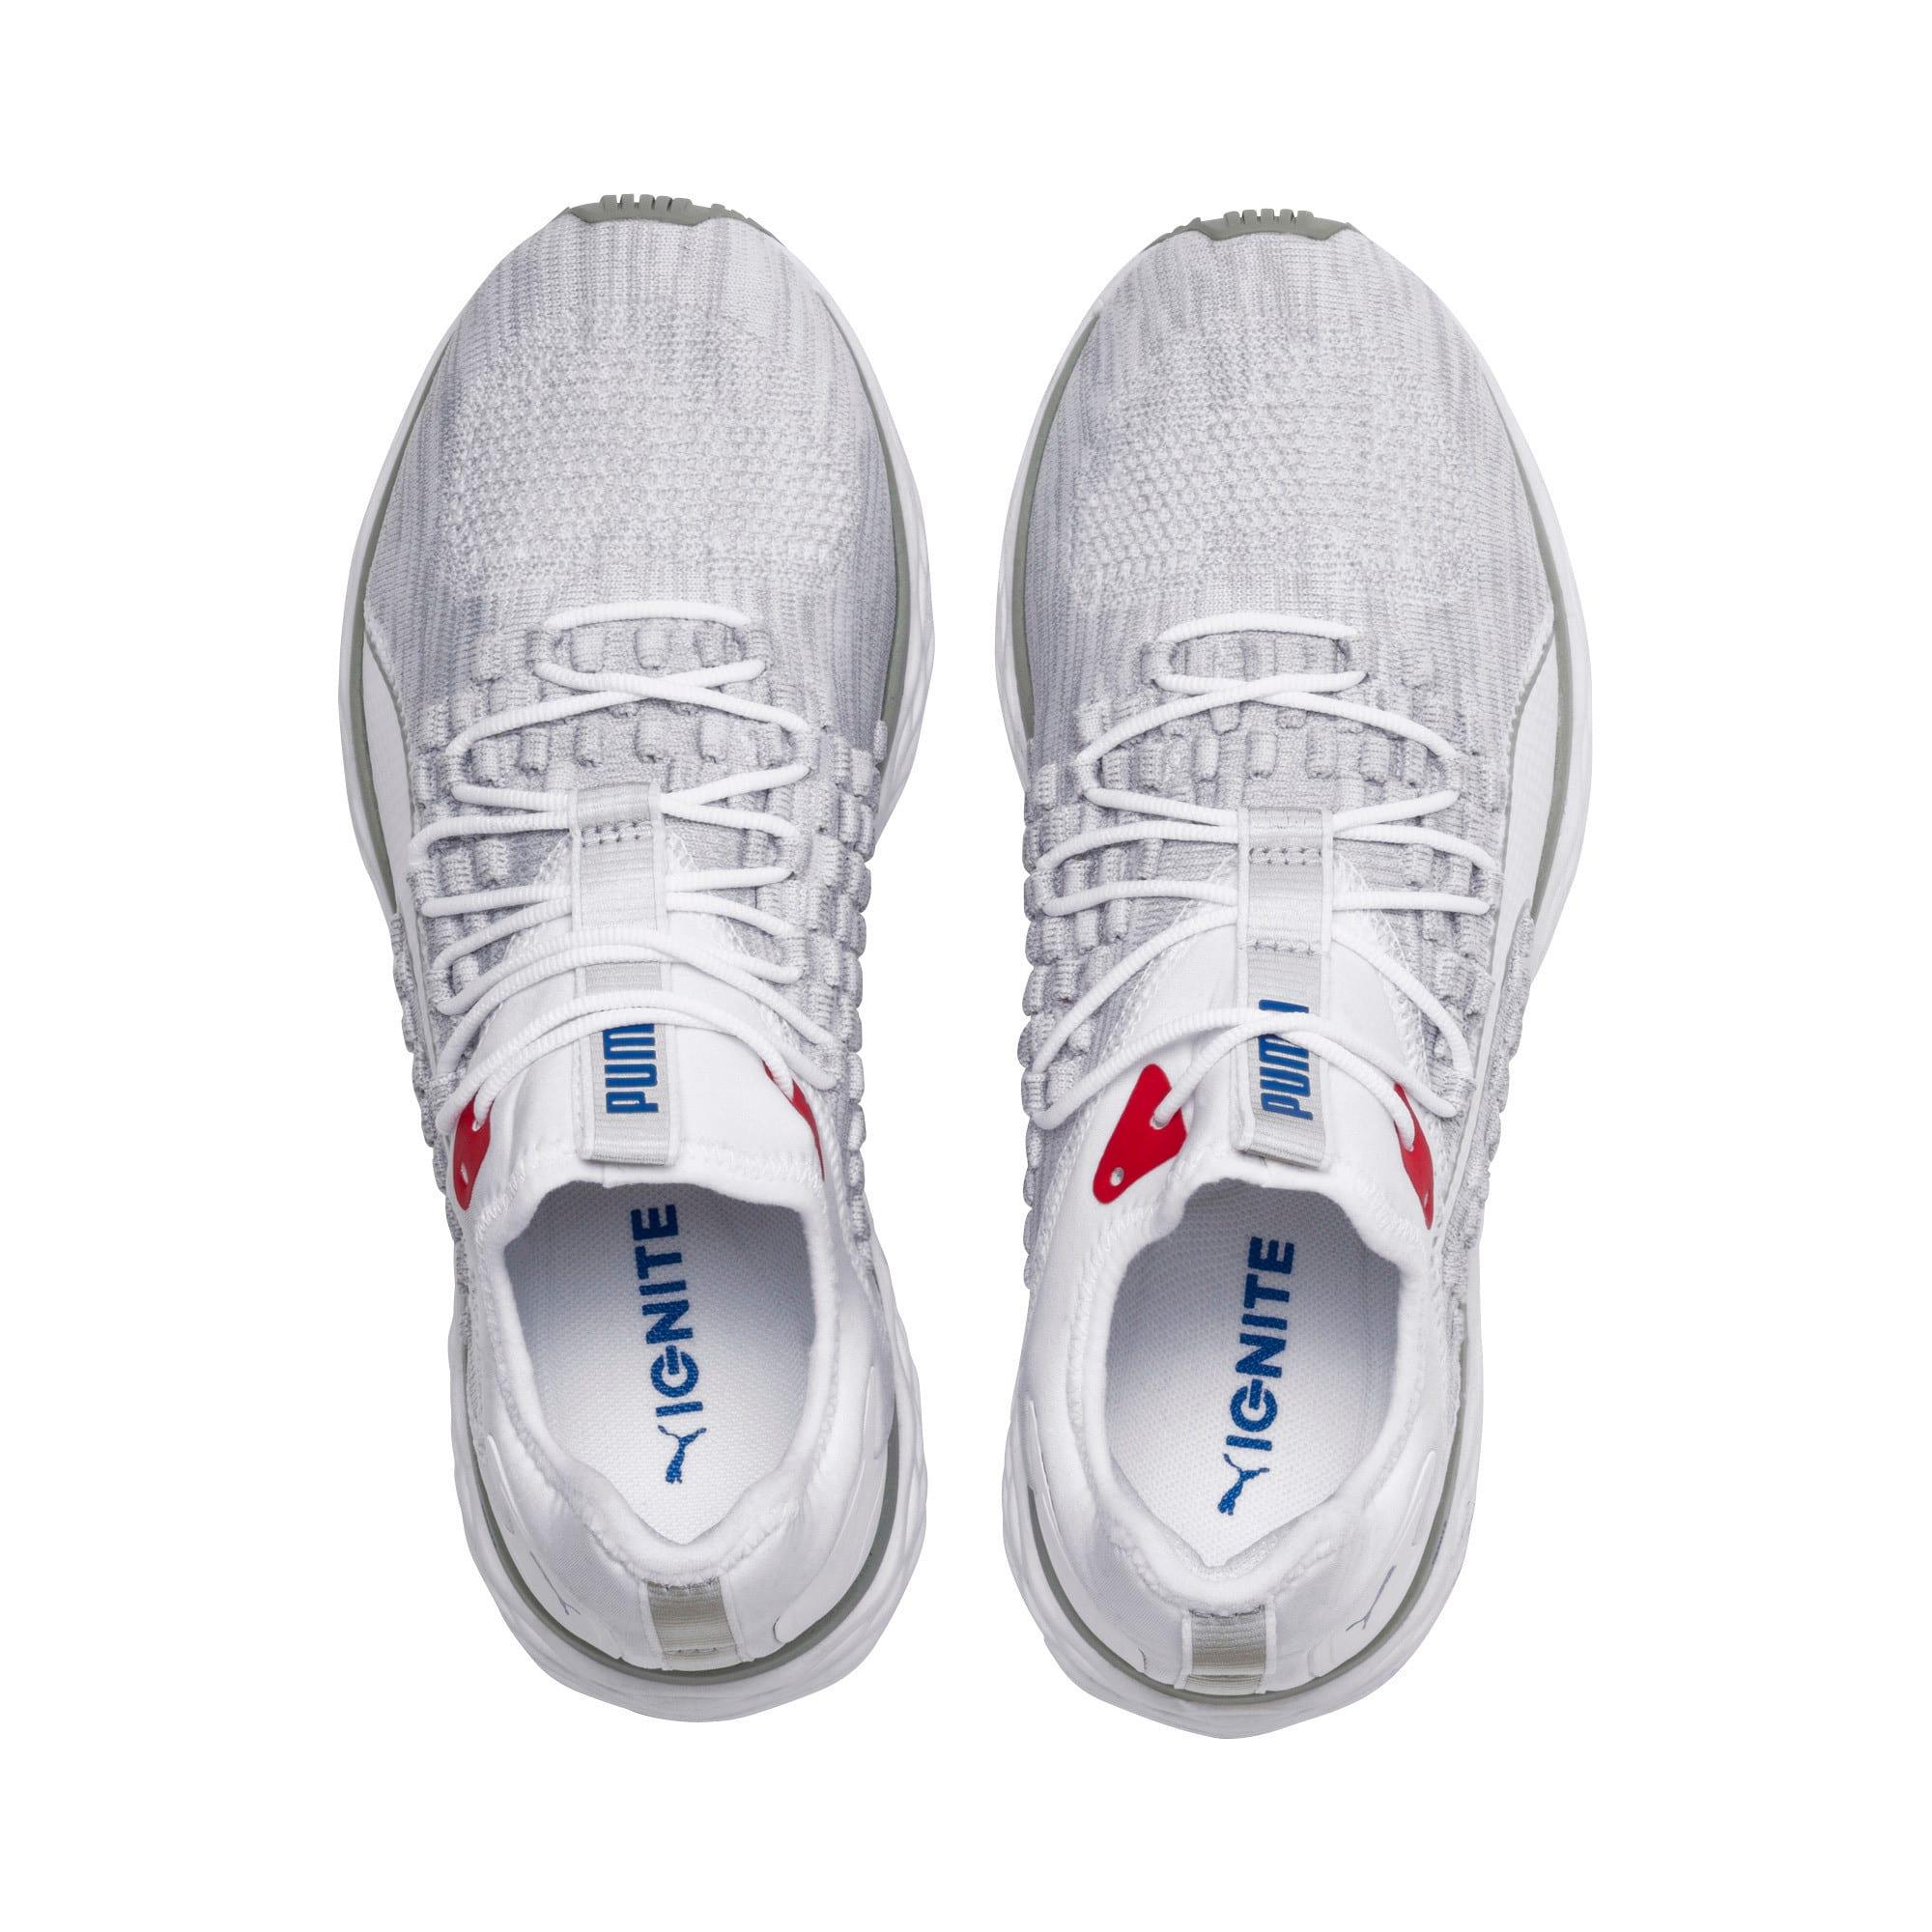 Thumbnail 6 of SPEED FUSEFIT Women's Running Shoes, Puma White-Quarry, medium-IND